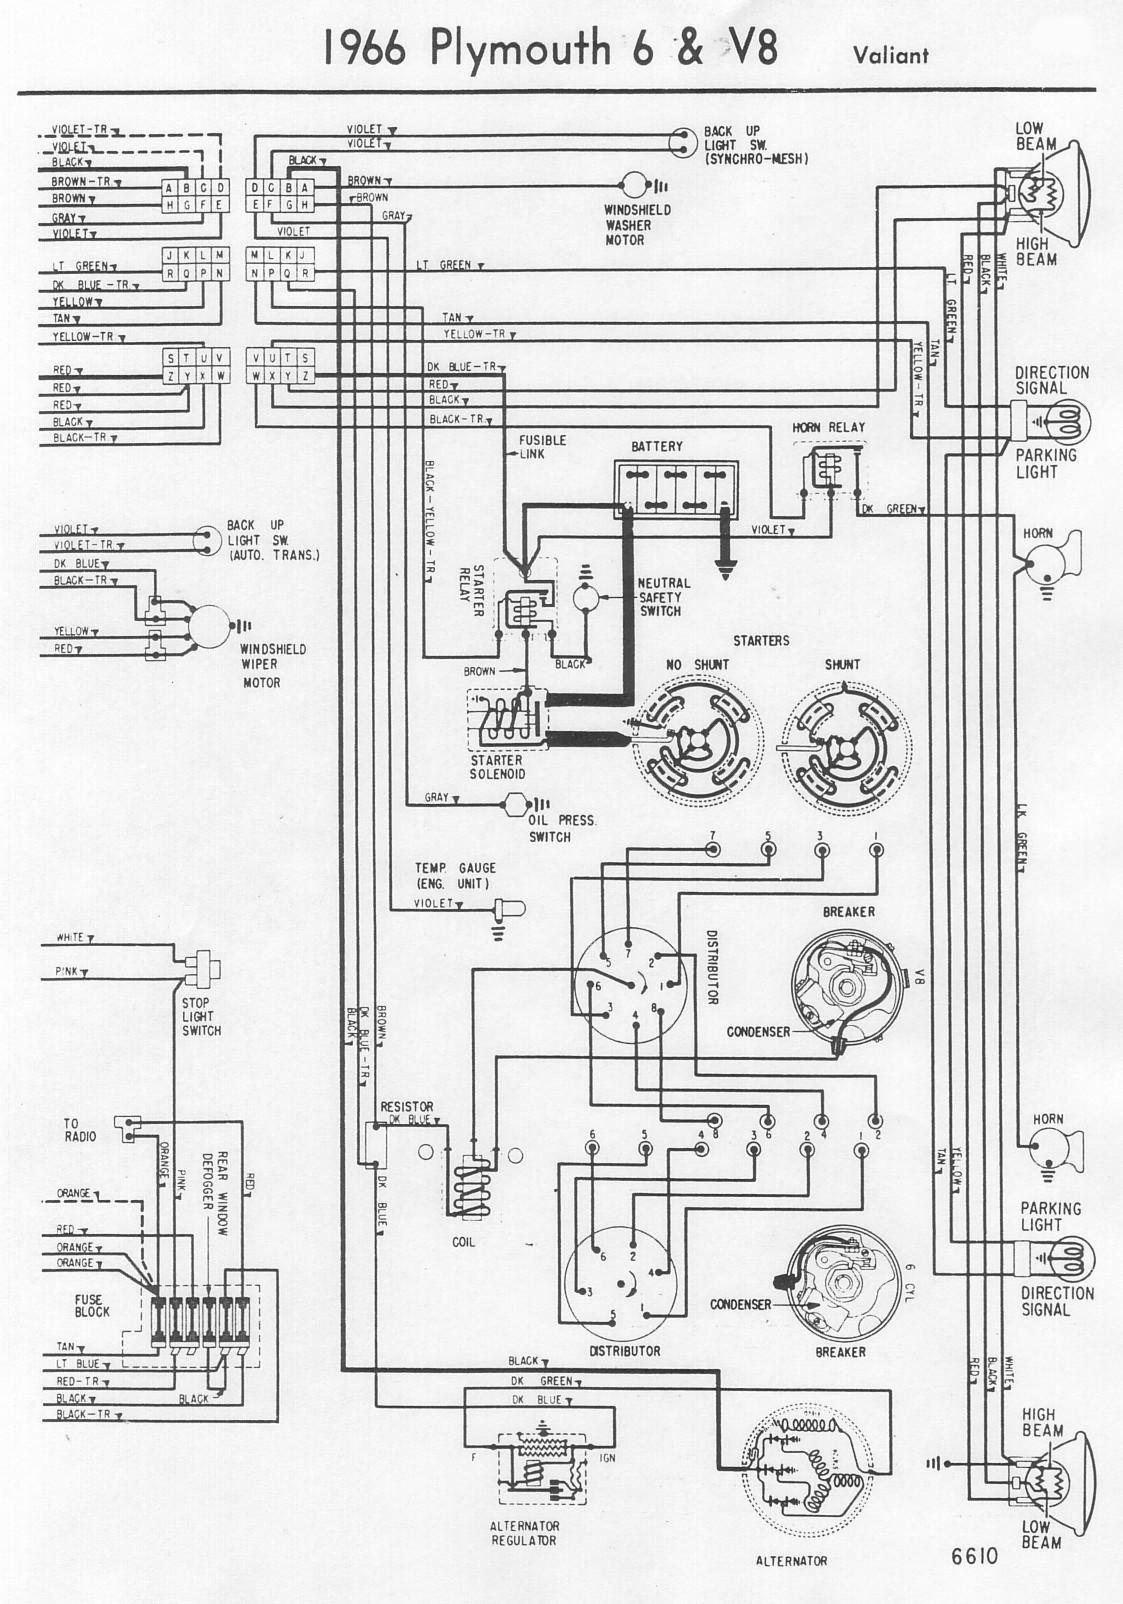 Awesome Suzuki Sv650 Wiring Diagram Elaboration - Everything You ...